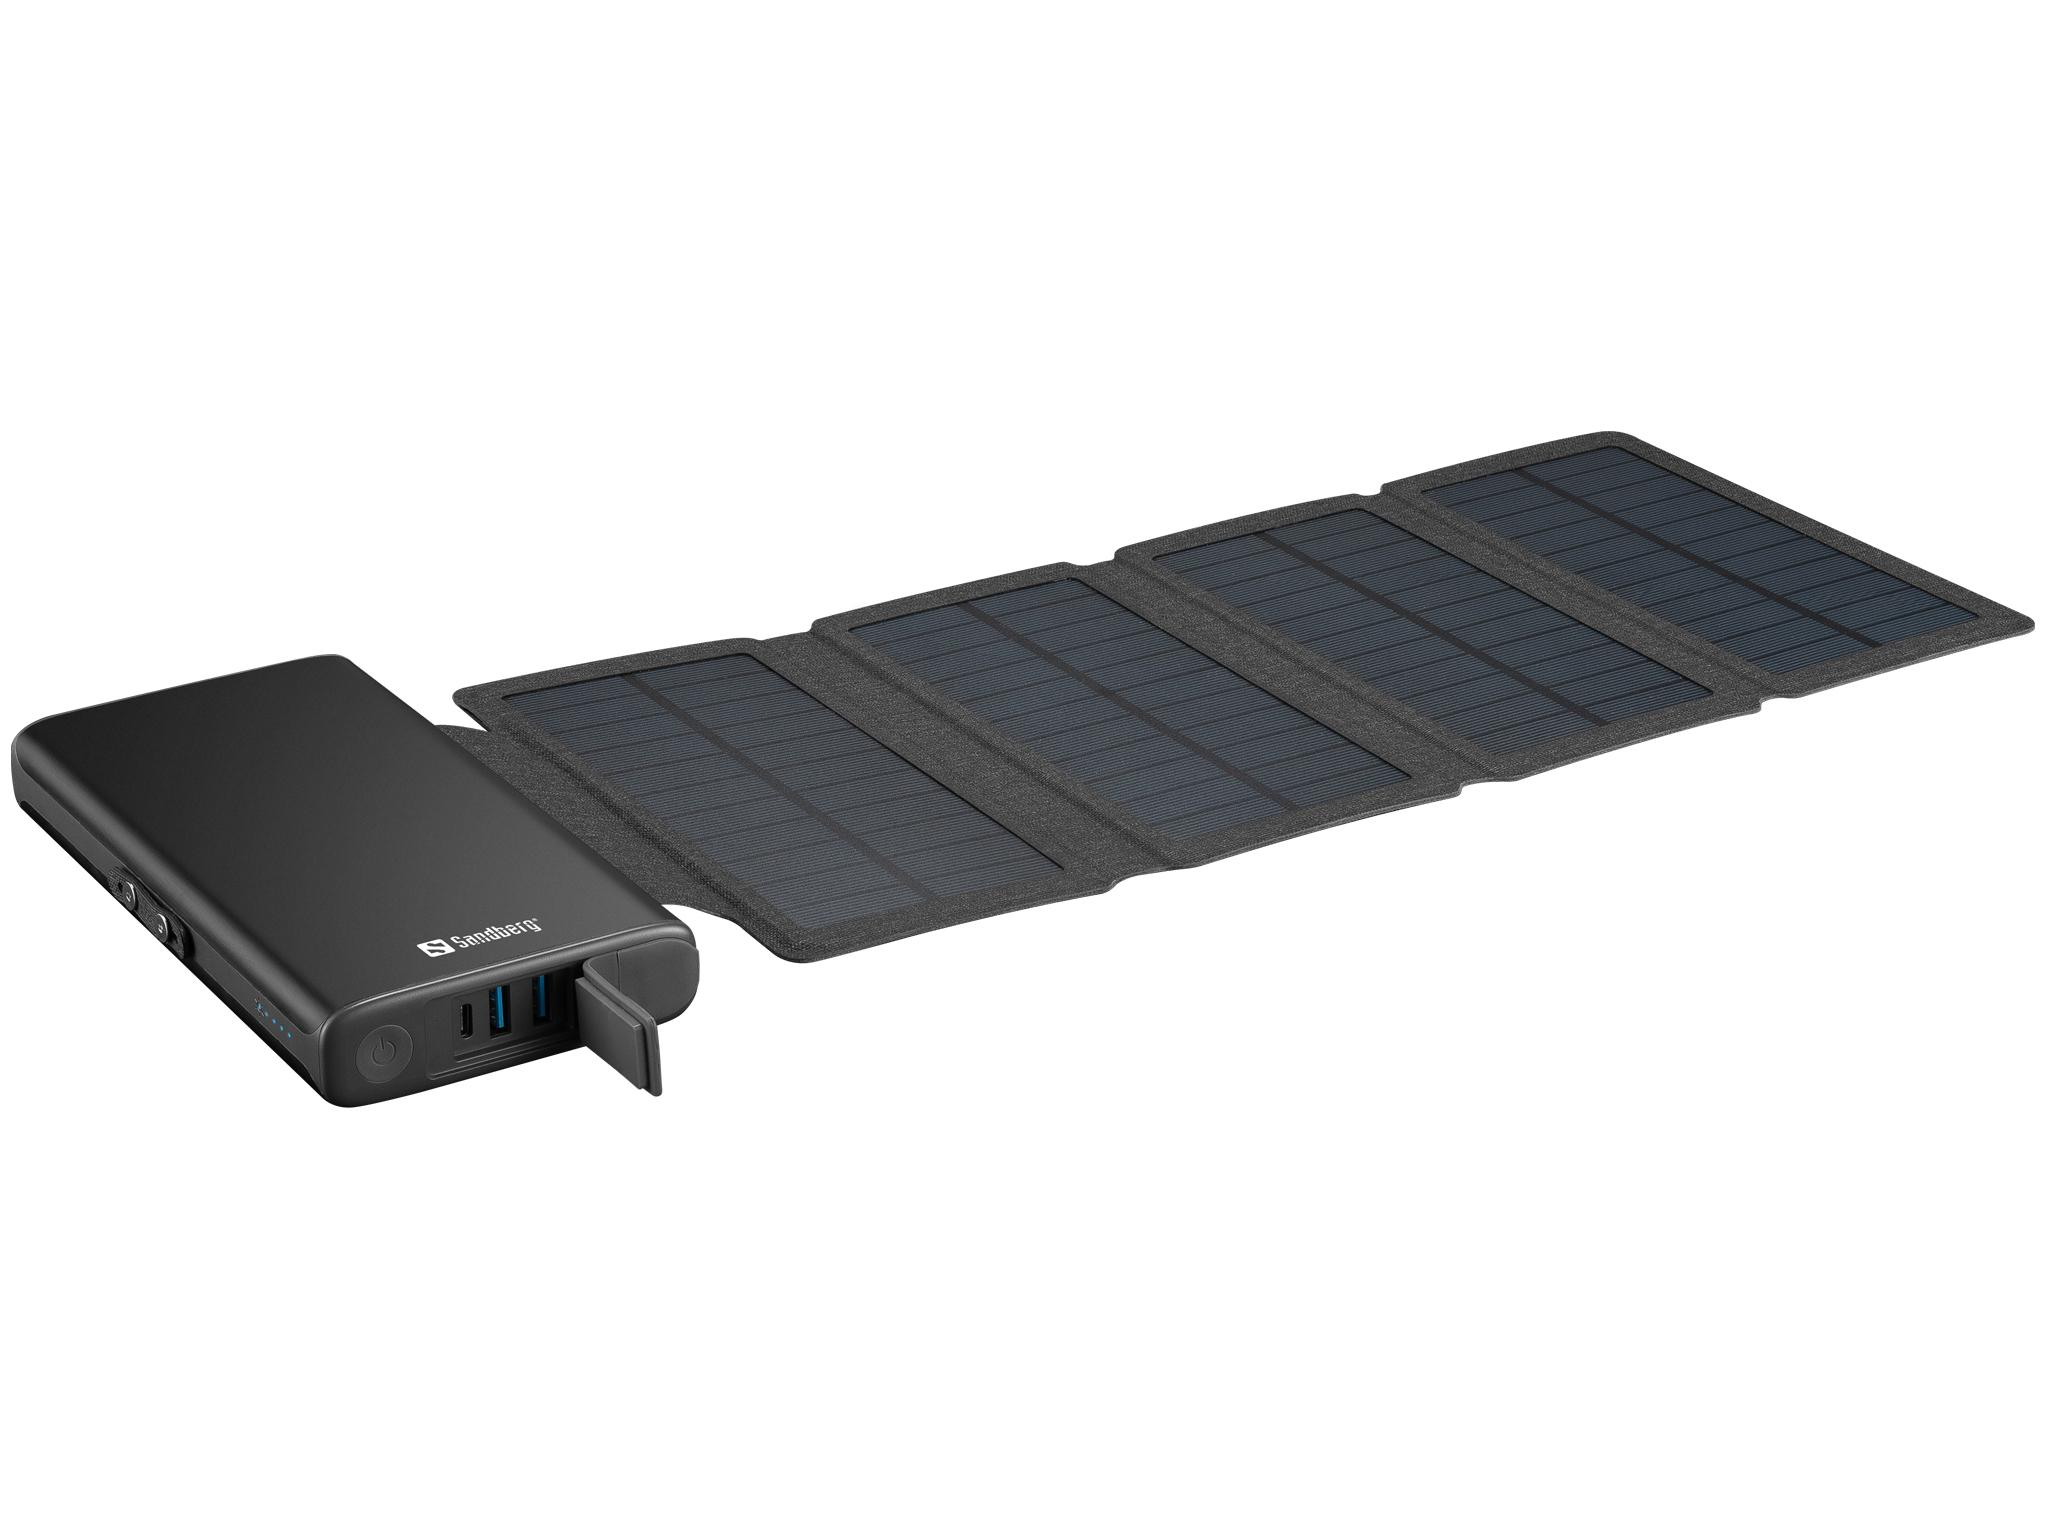 Sandberg 4 panelna solarna prenosna baterija 25.000